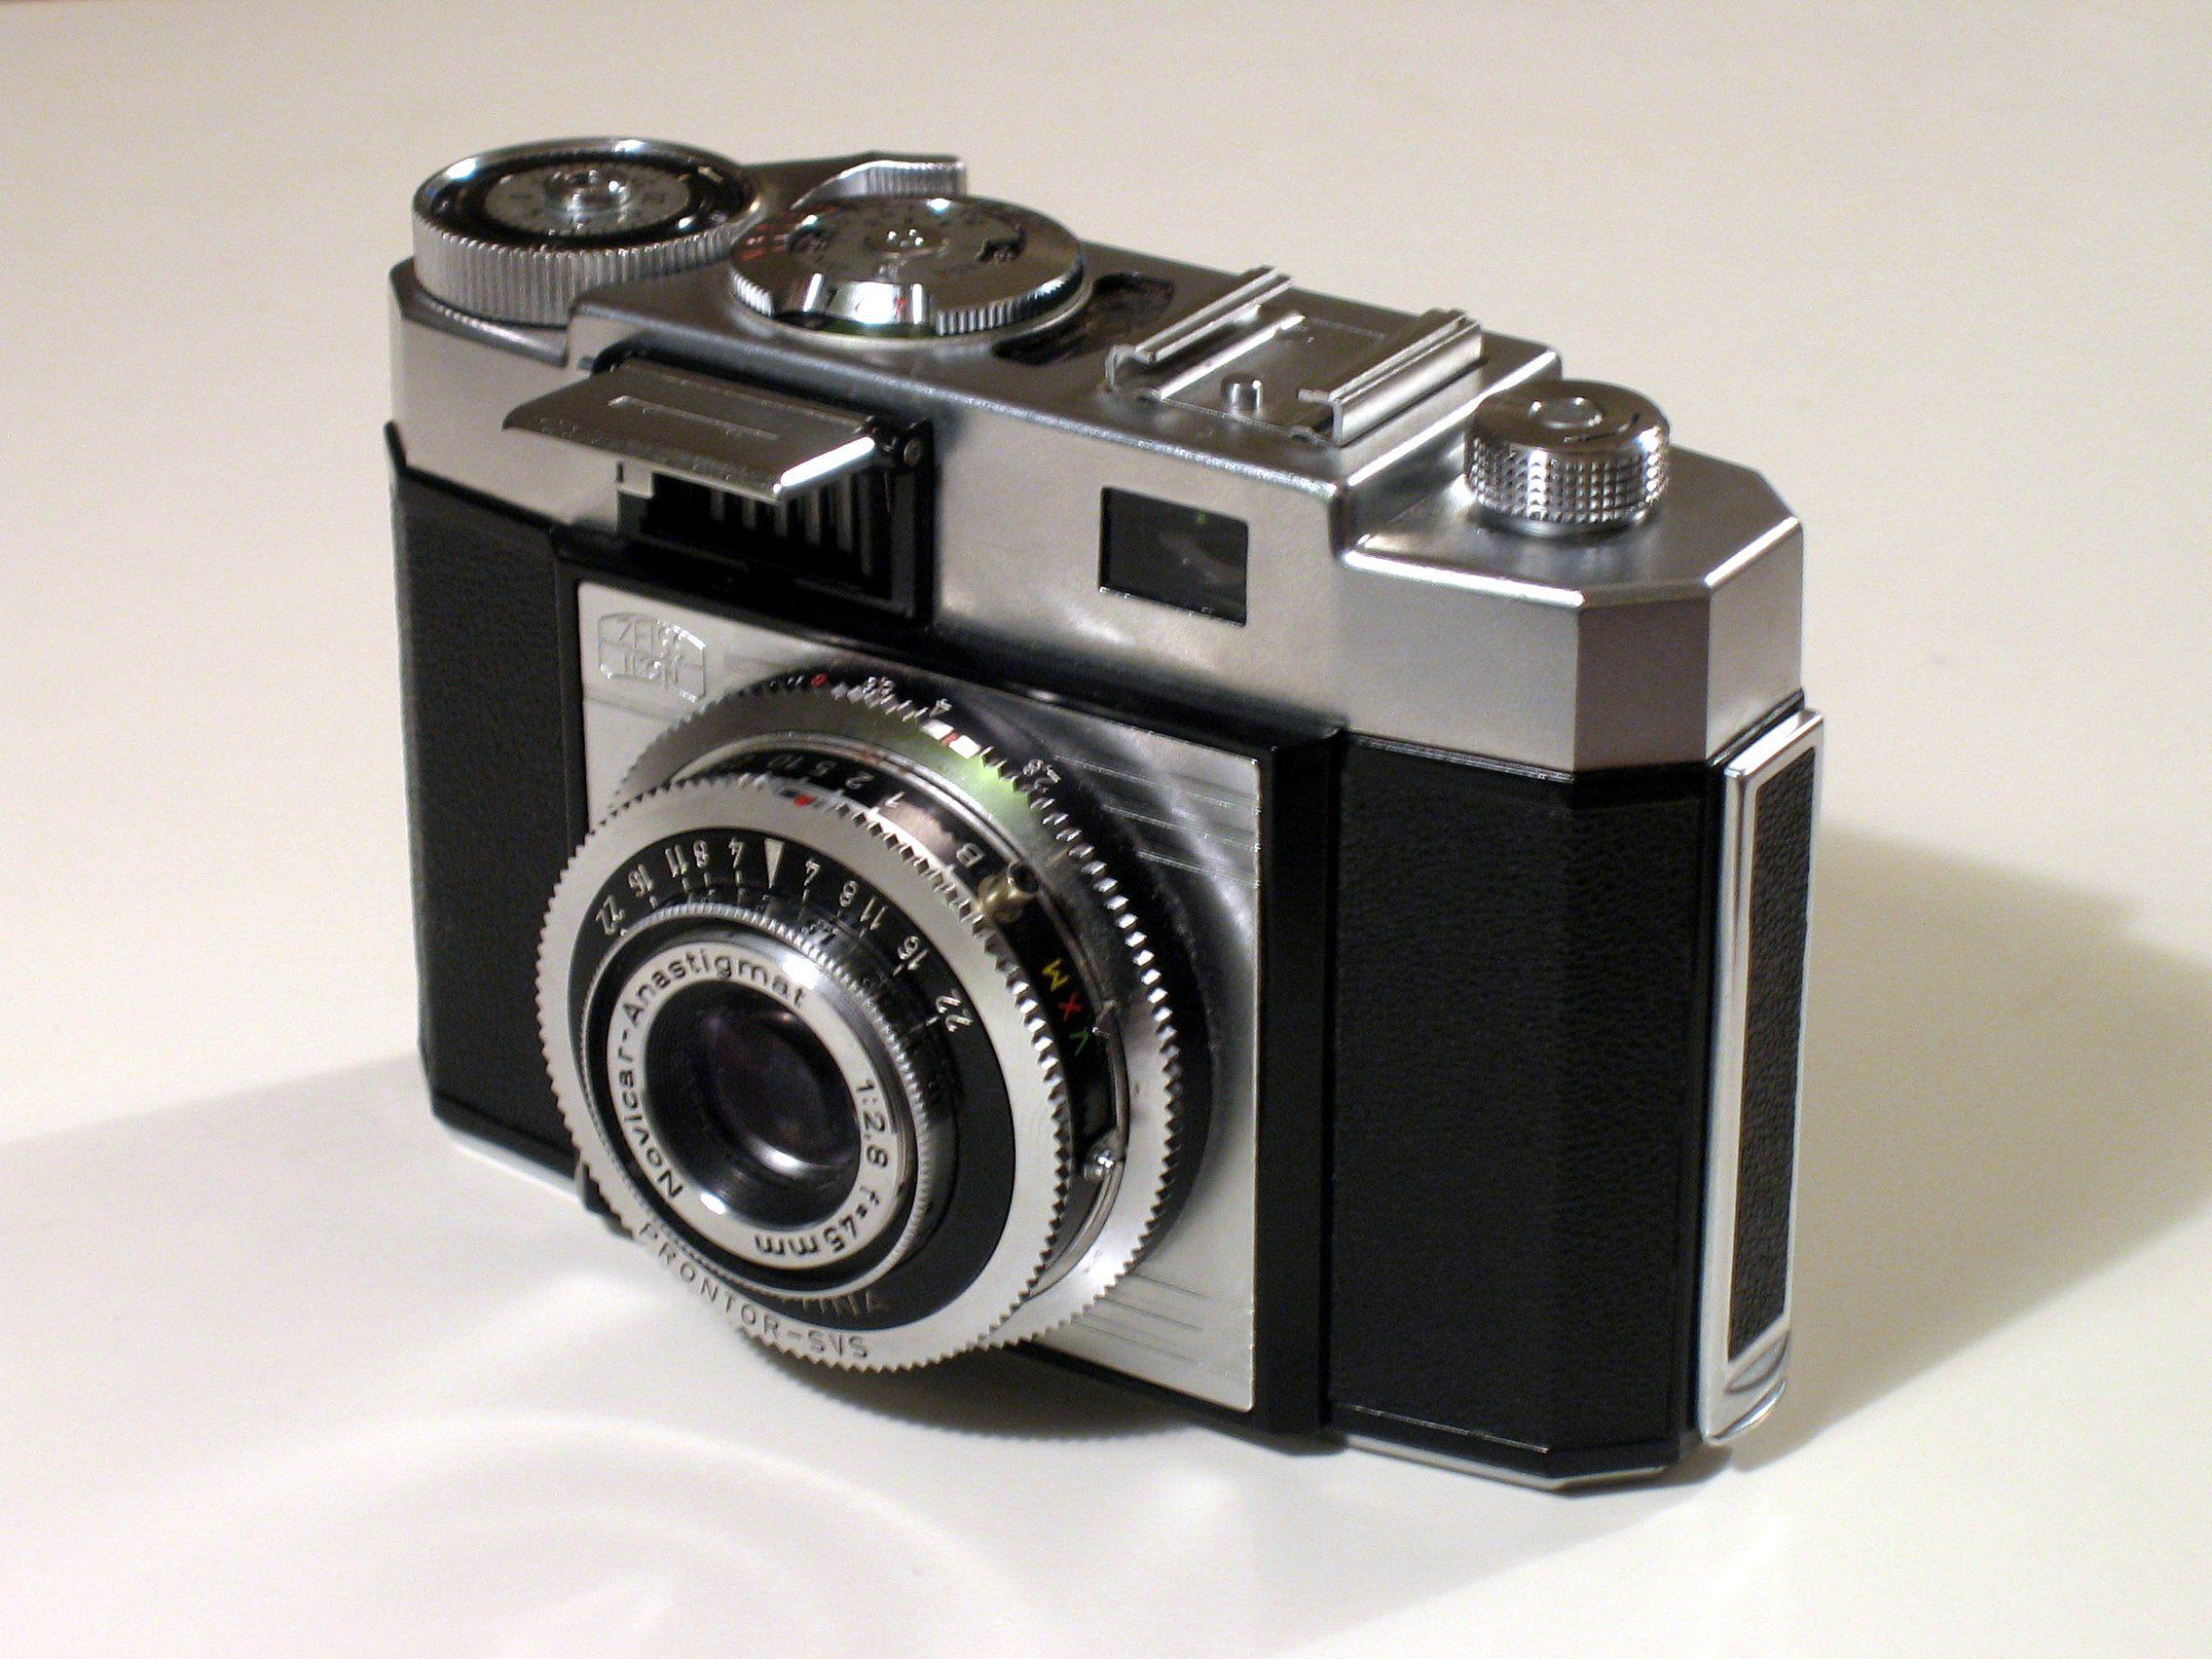 old cameras - Google Search | cammeras | Pinterest | Cameras ...